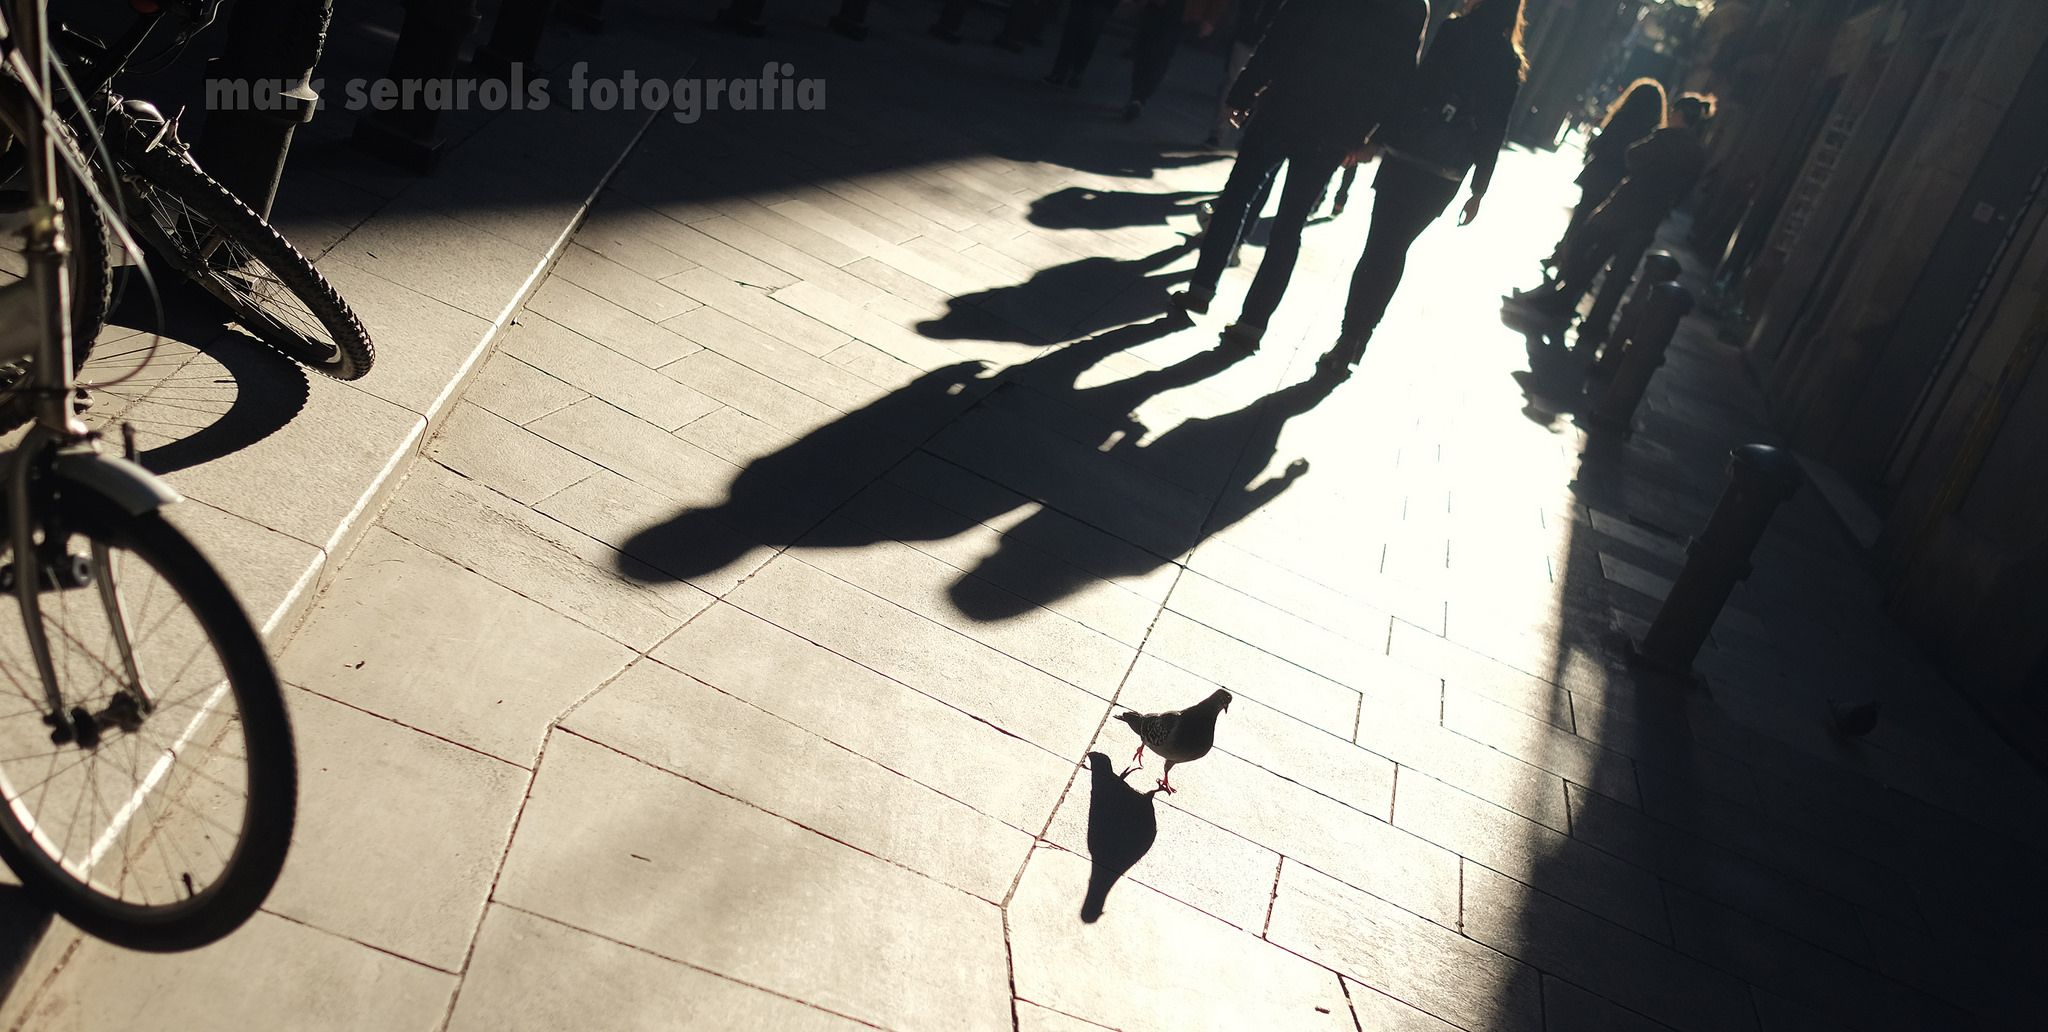 https://flic.kr/p/ChgfWy | xino xano | www.facebook.com/SeracatPhotography/